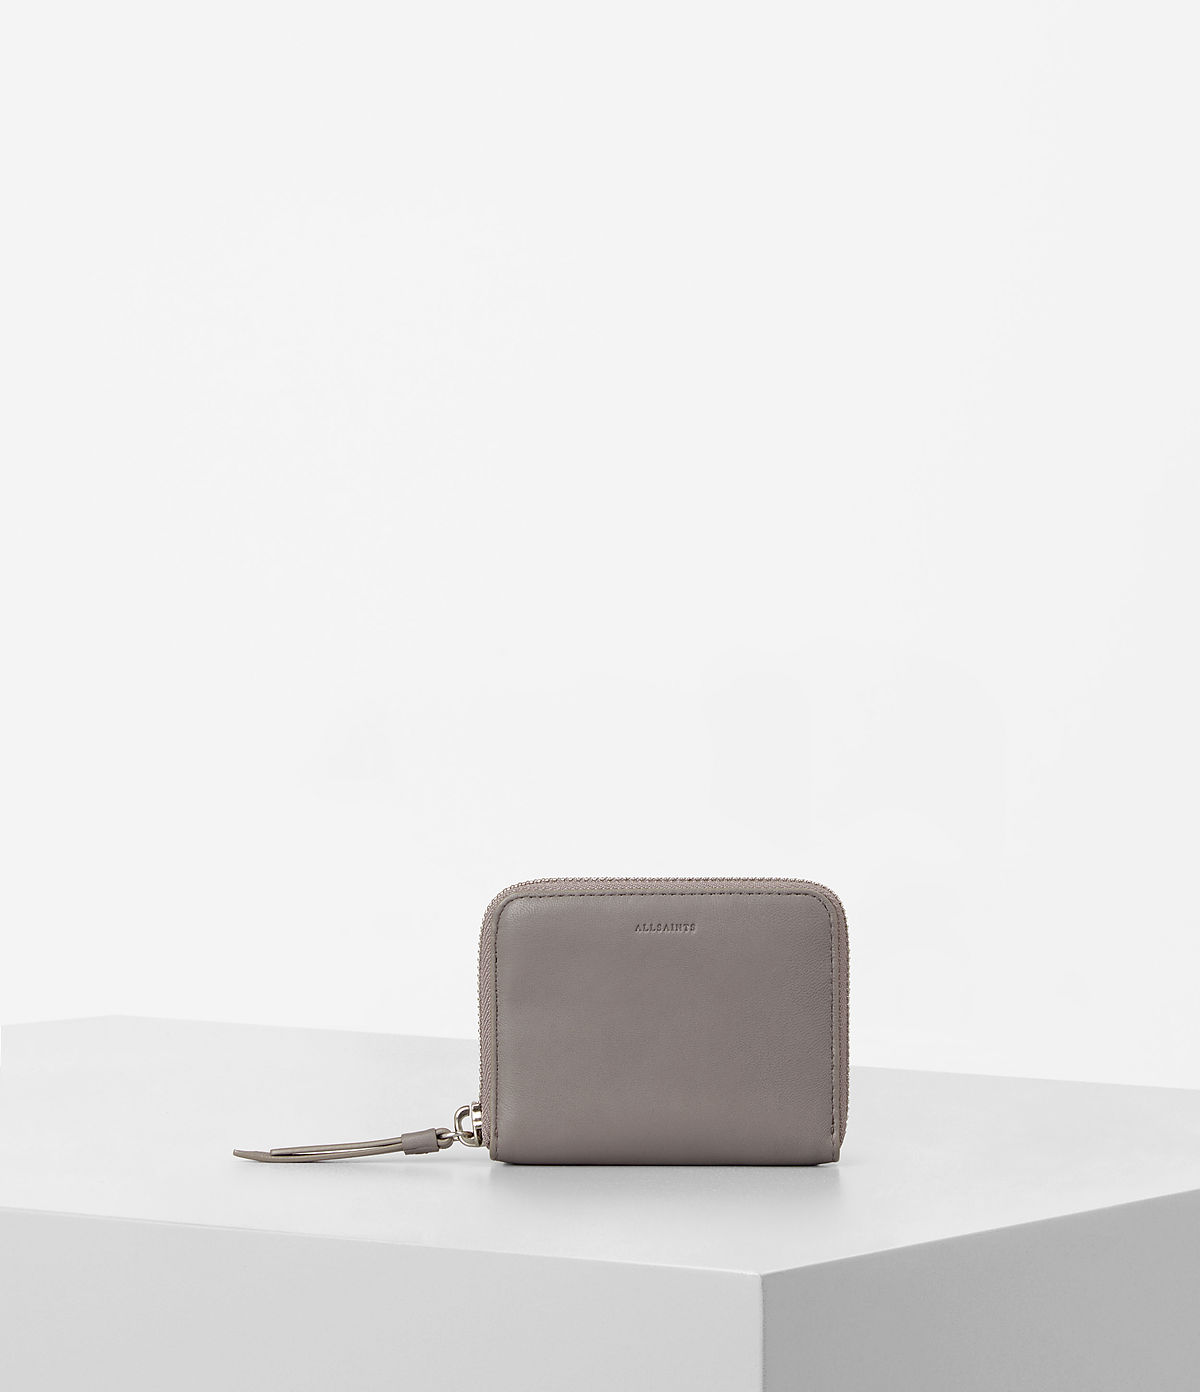 kanda-mini-leather-wallet